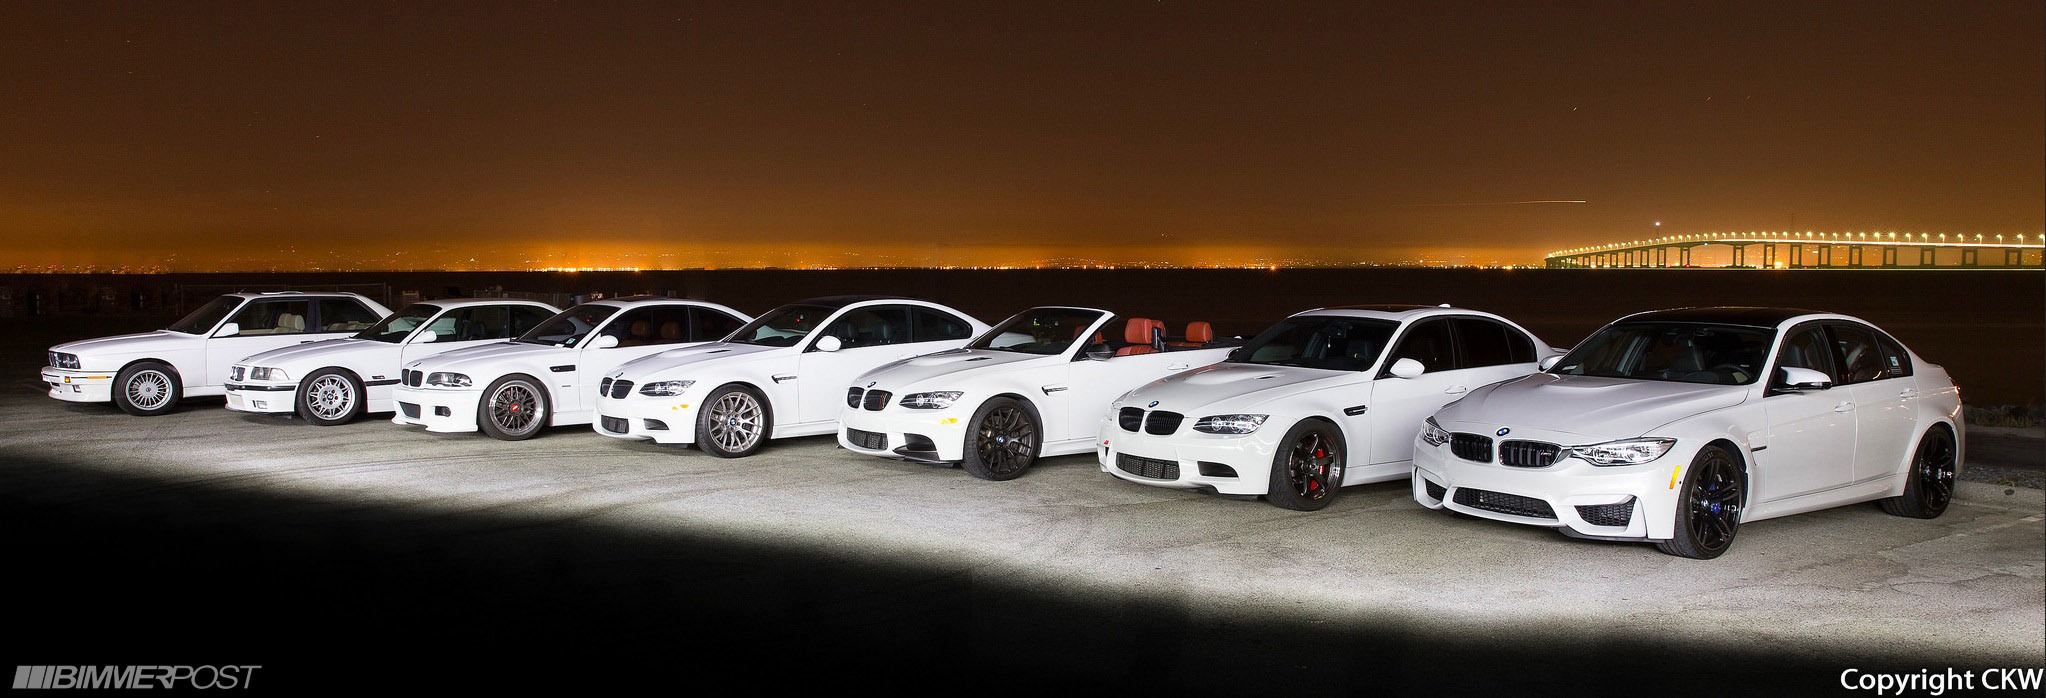 white-m3-lineup1.jpg